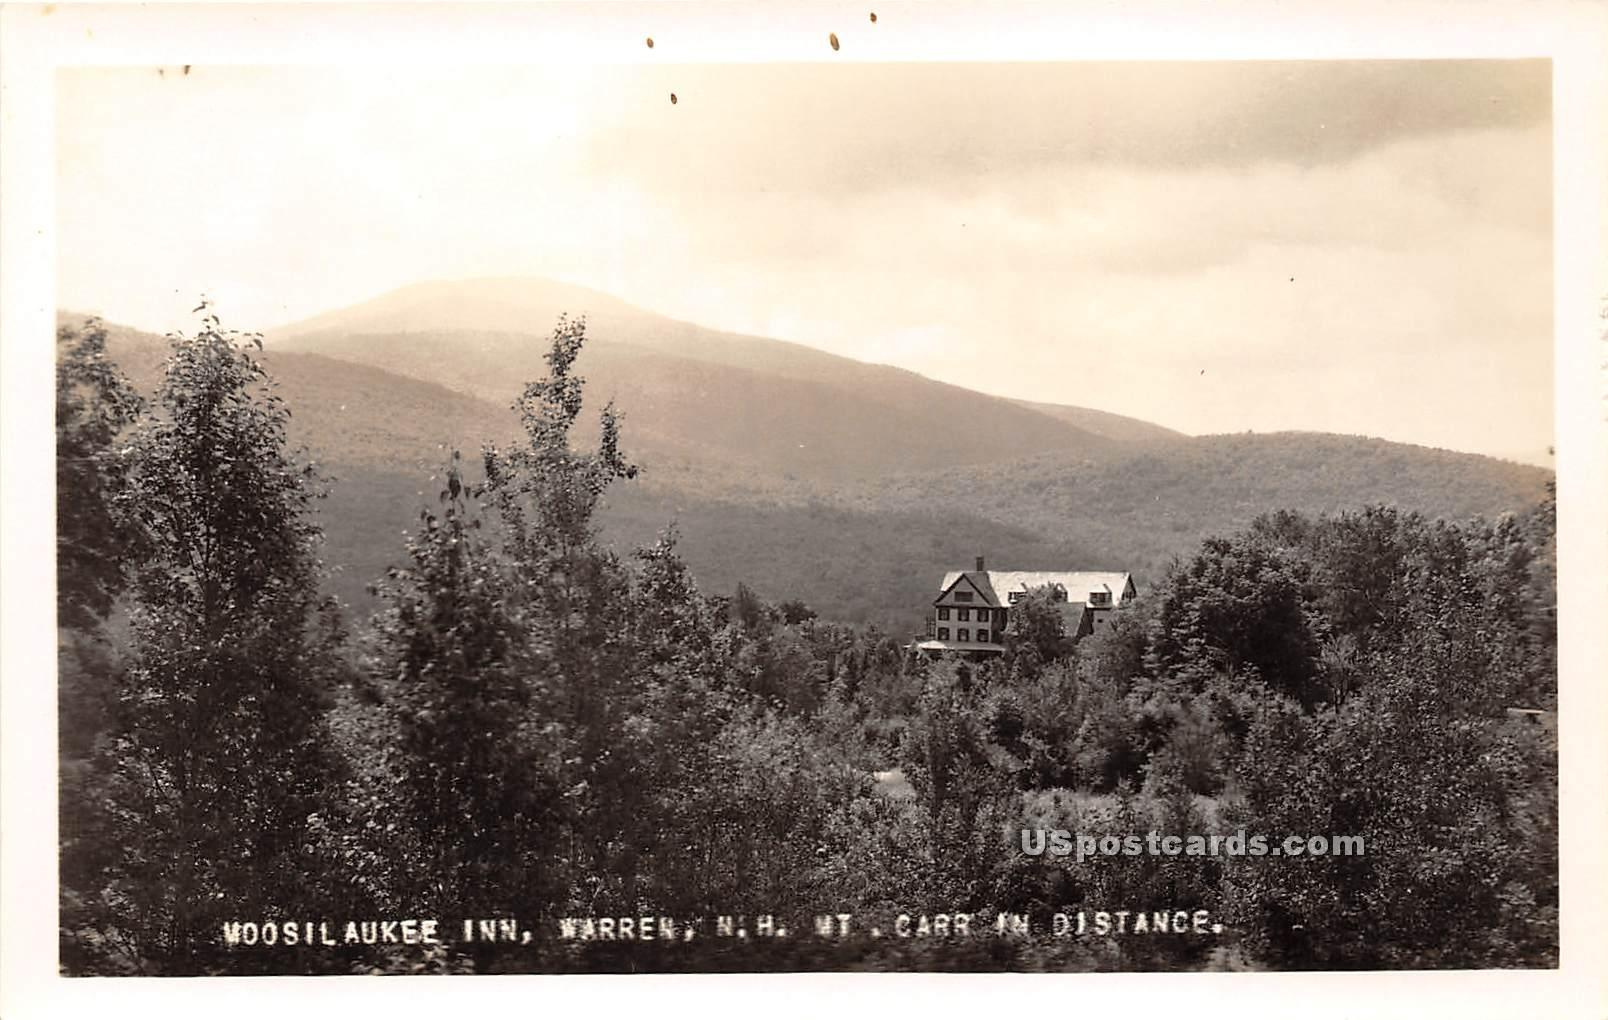 Moosilaukee Inn - Warren, Vermont VT Postcard